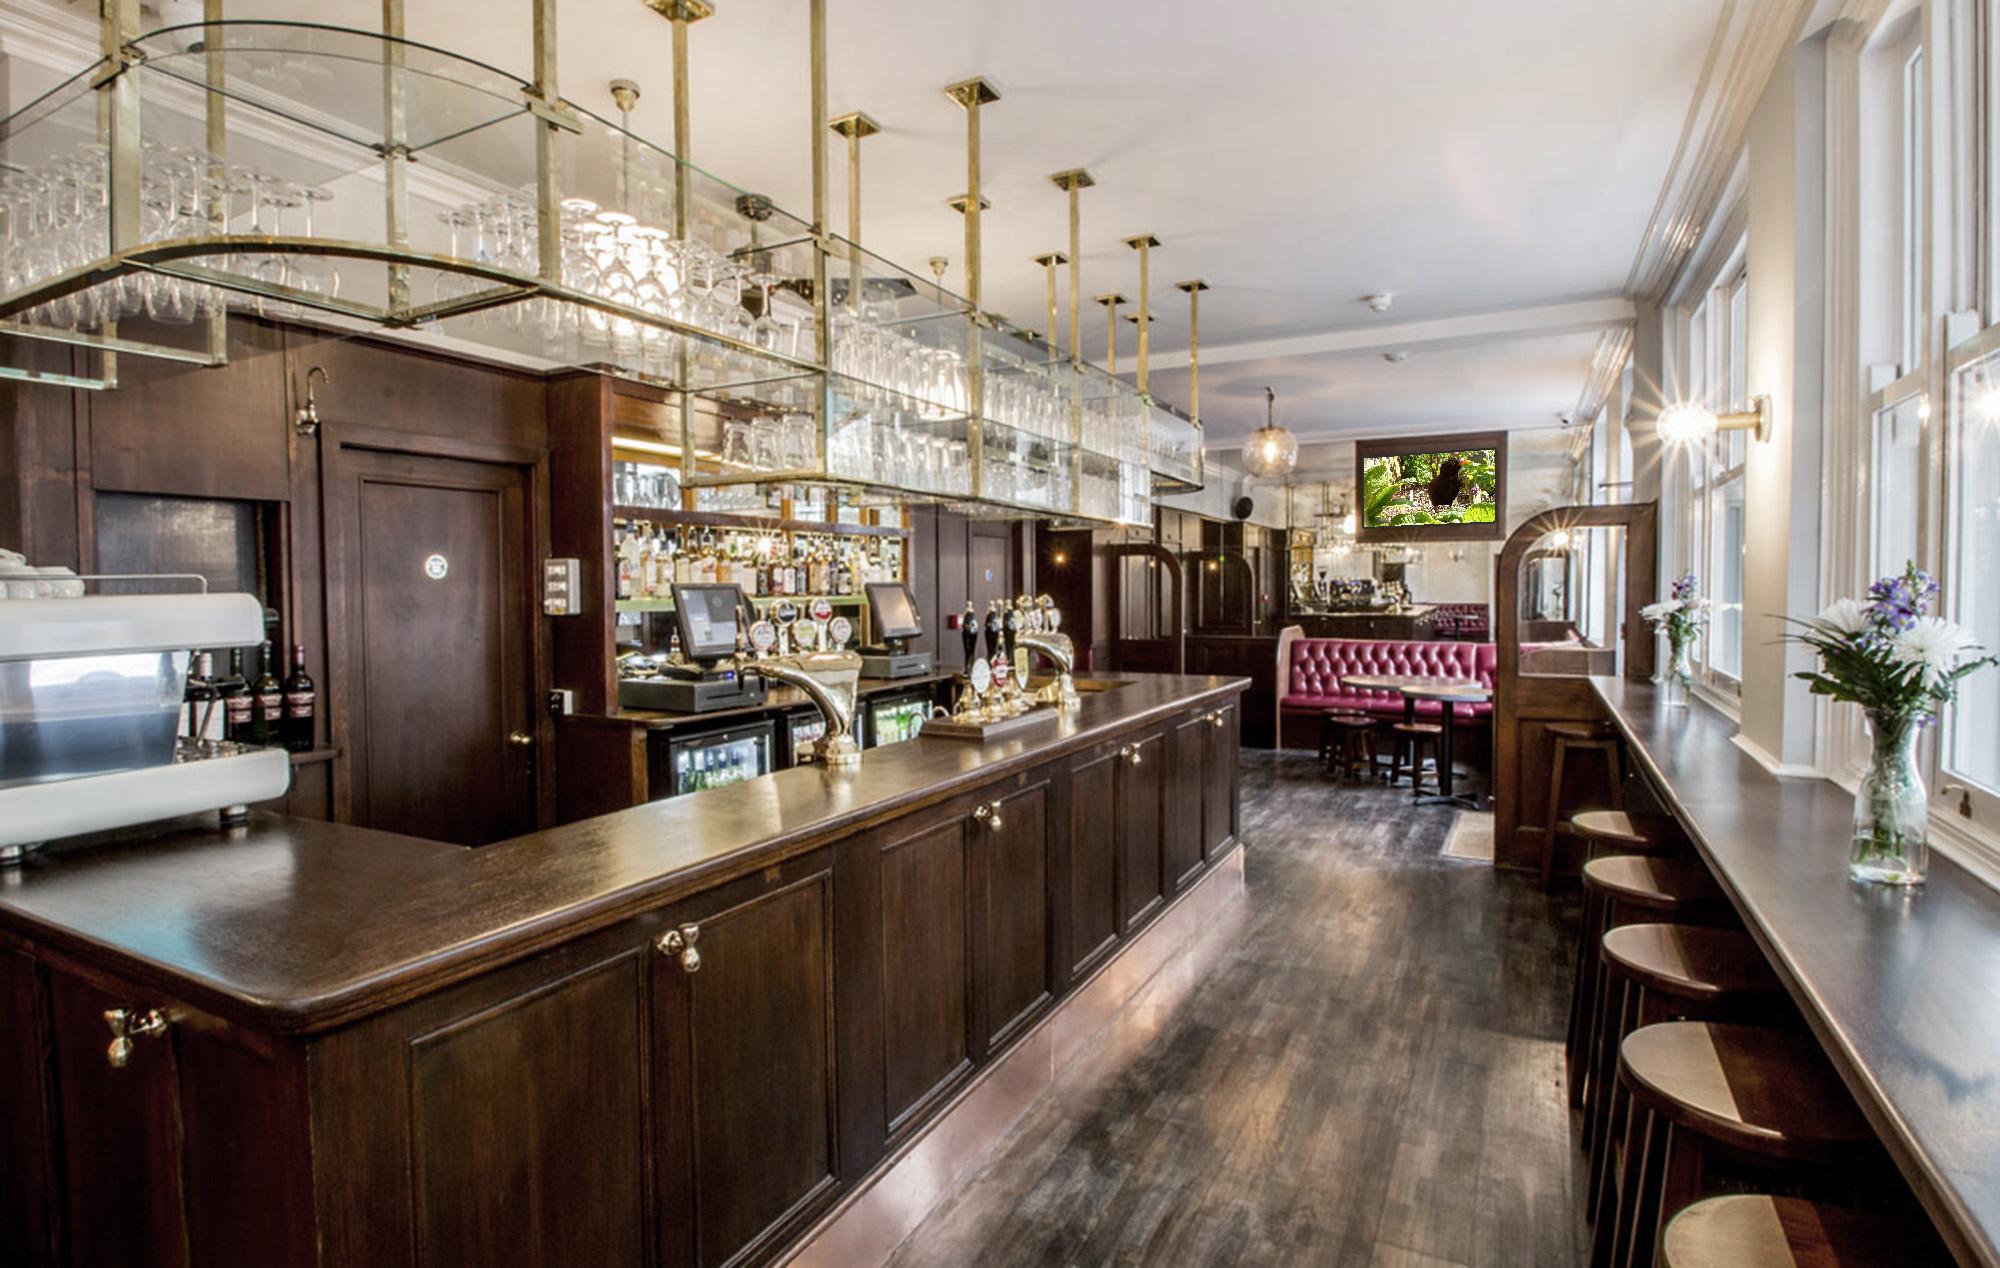 Hour Glass Pub   279-283 Brompton Rd   Chelsea, London SW3 2DY